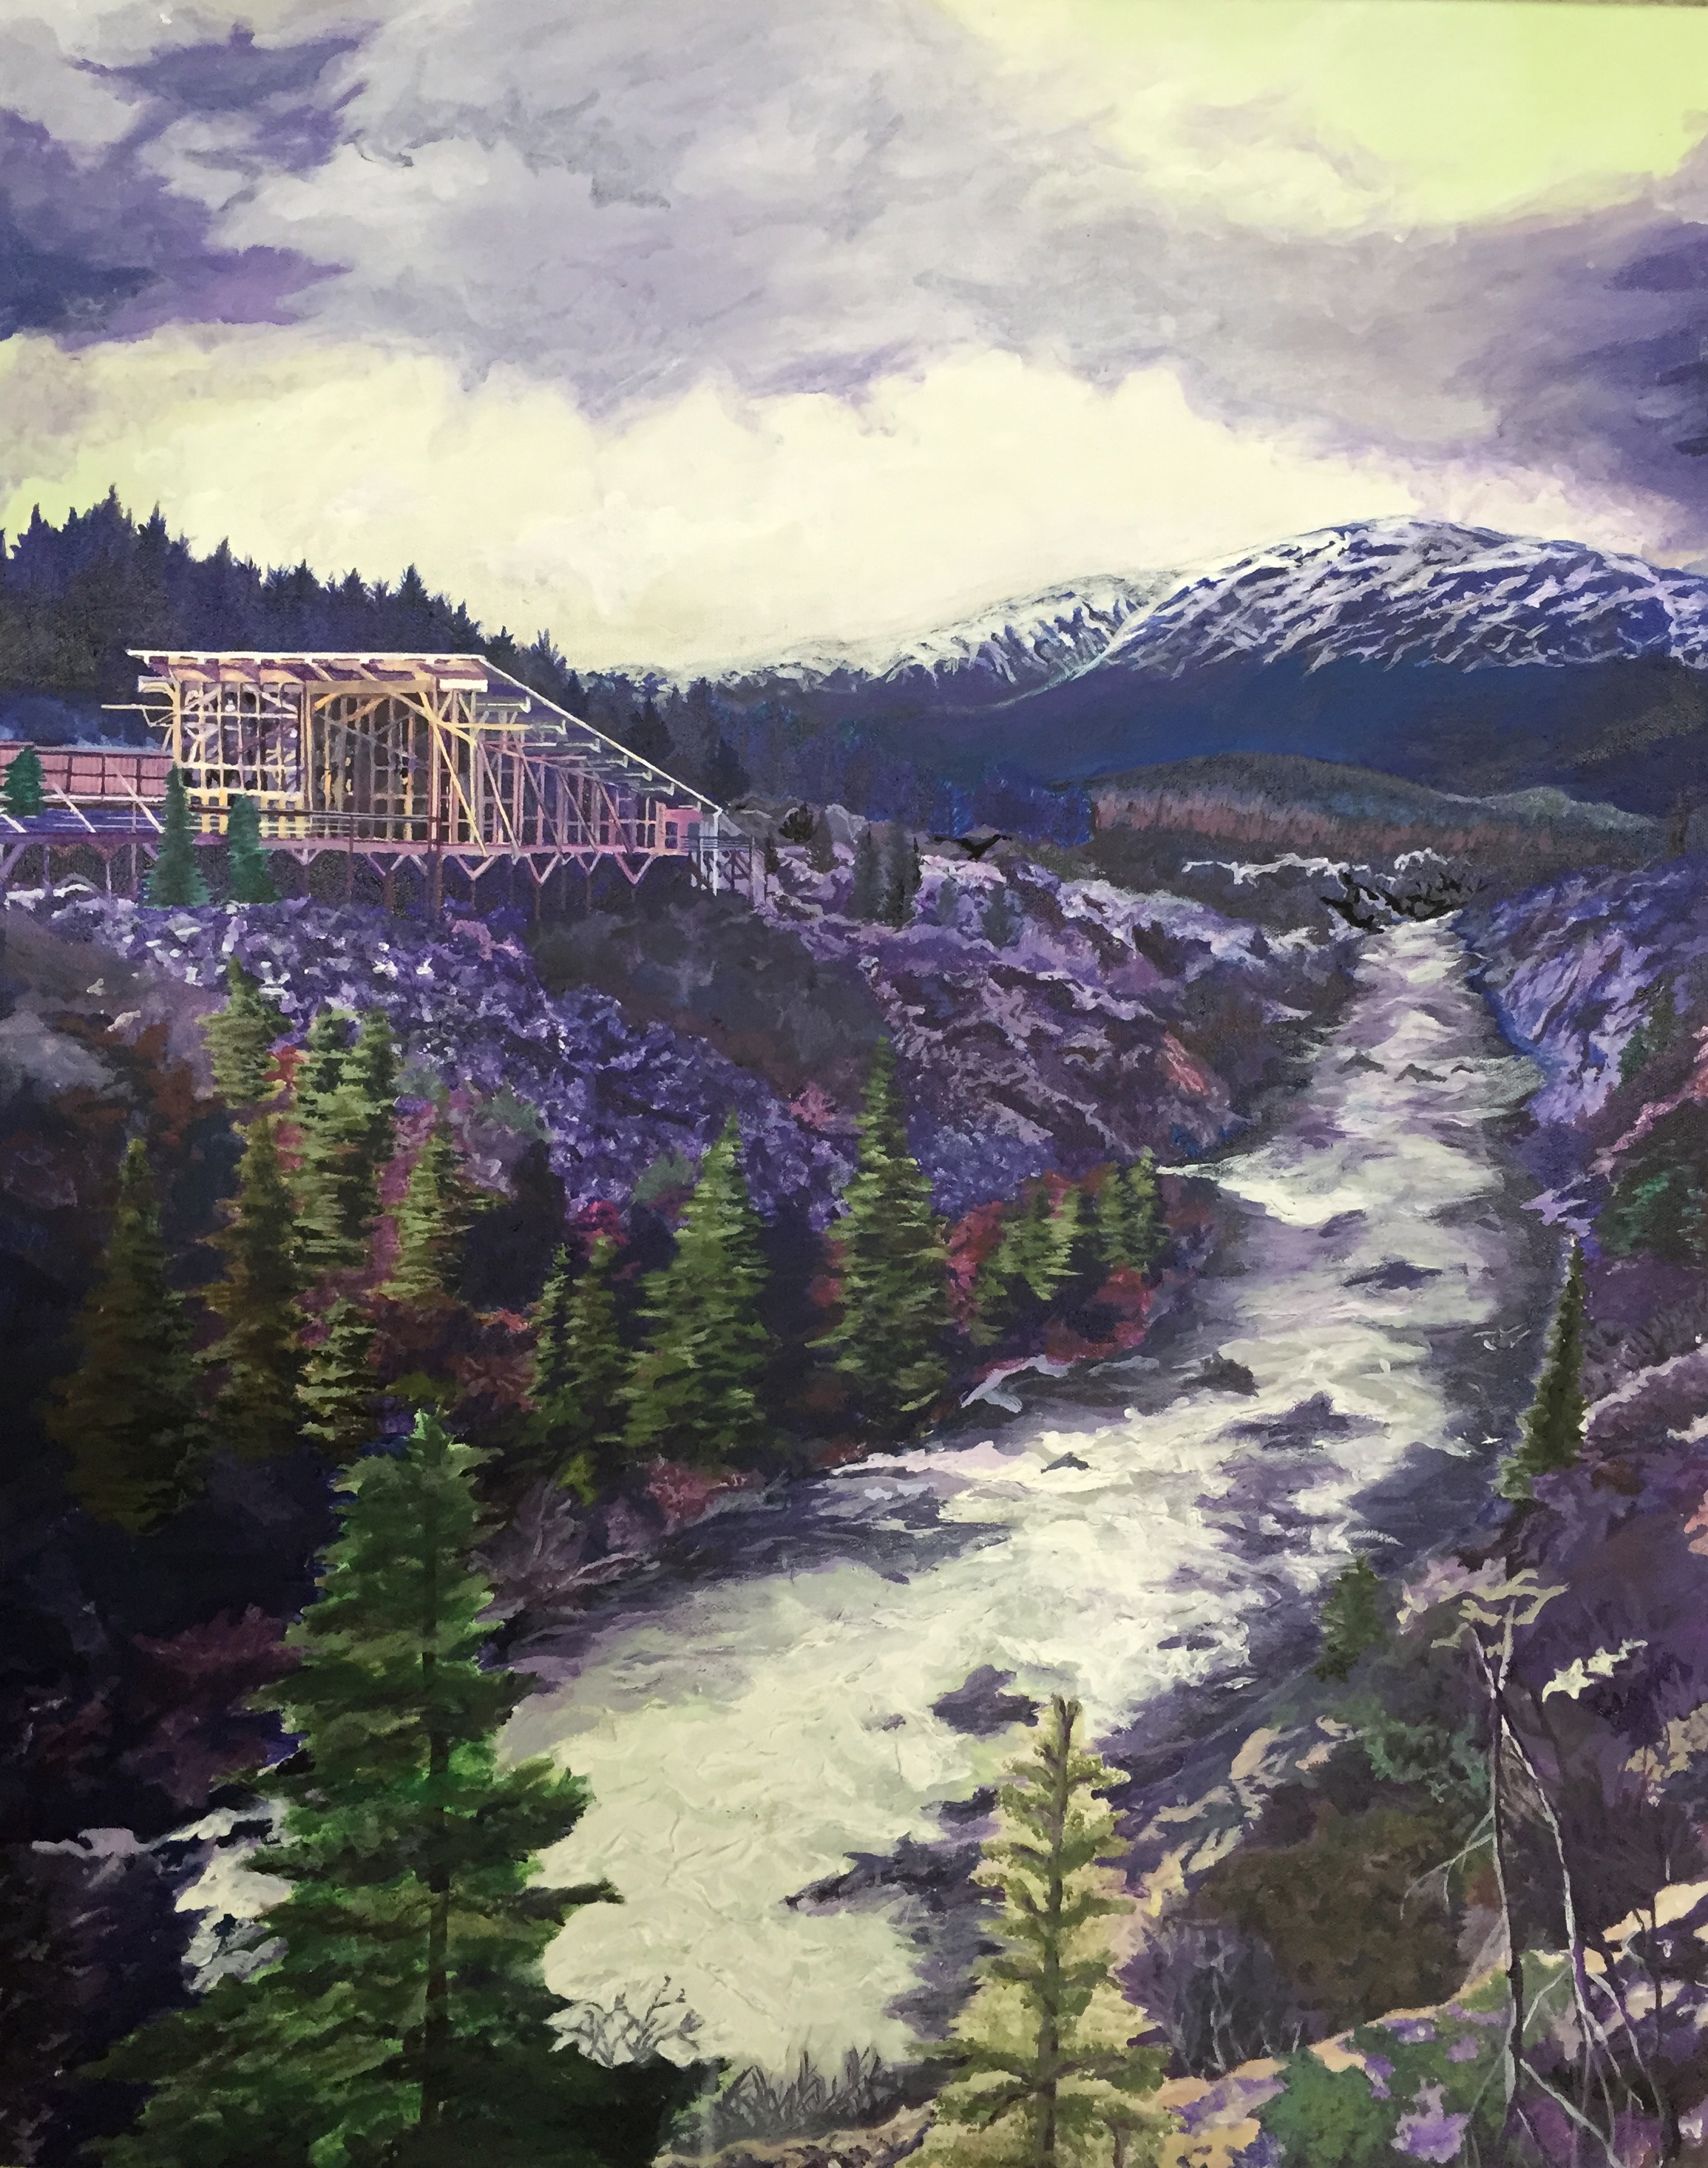 Acrylic landscape by Sarah Chow